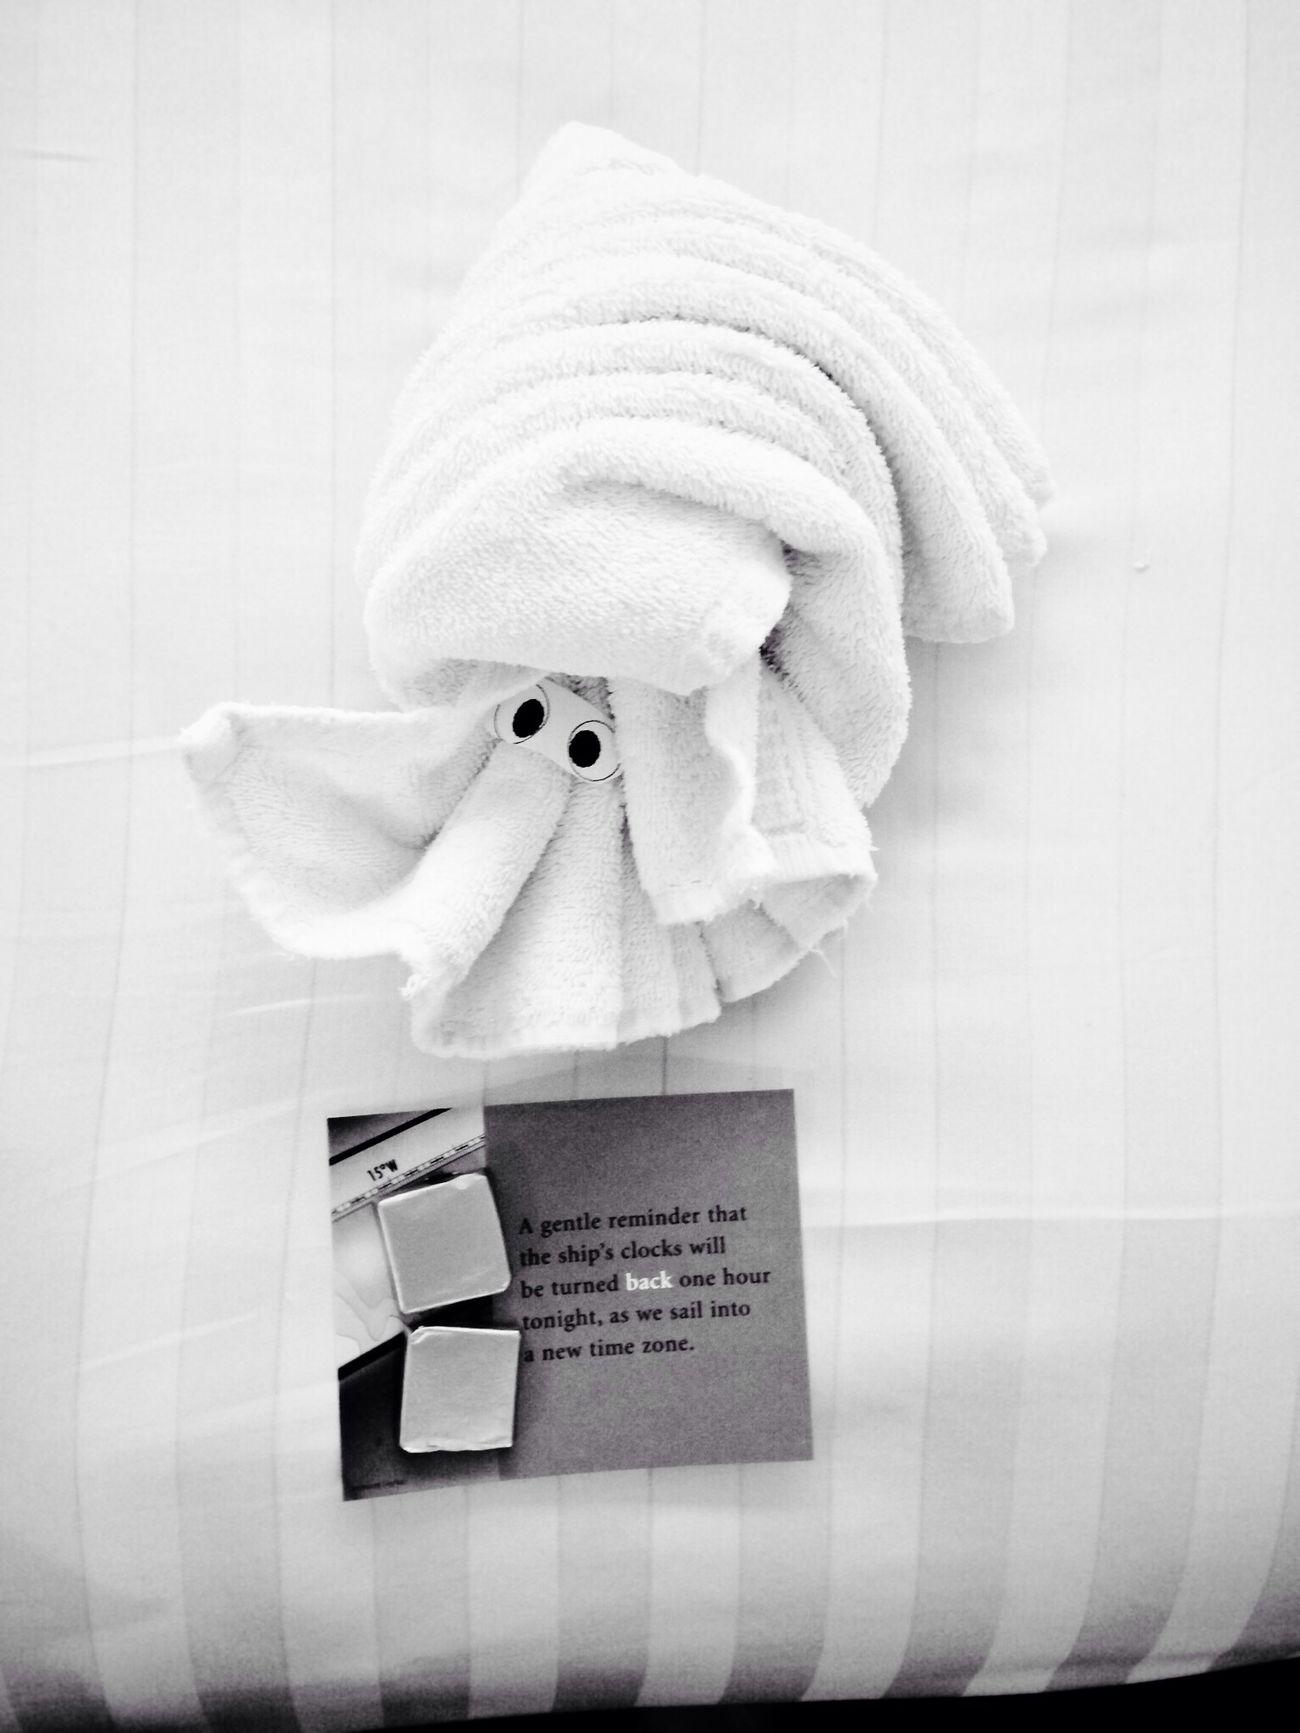 IPhoneography Blackandwhite Hotel Room Towel Animal